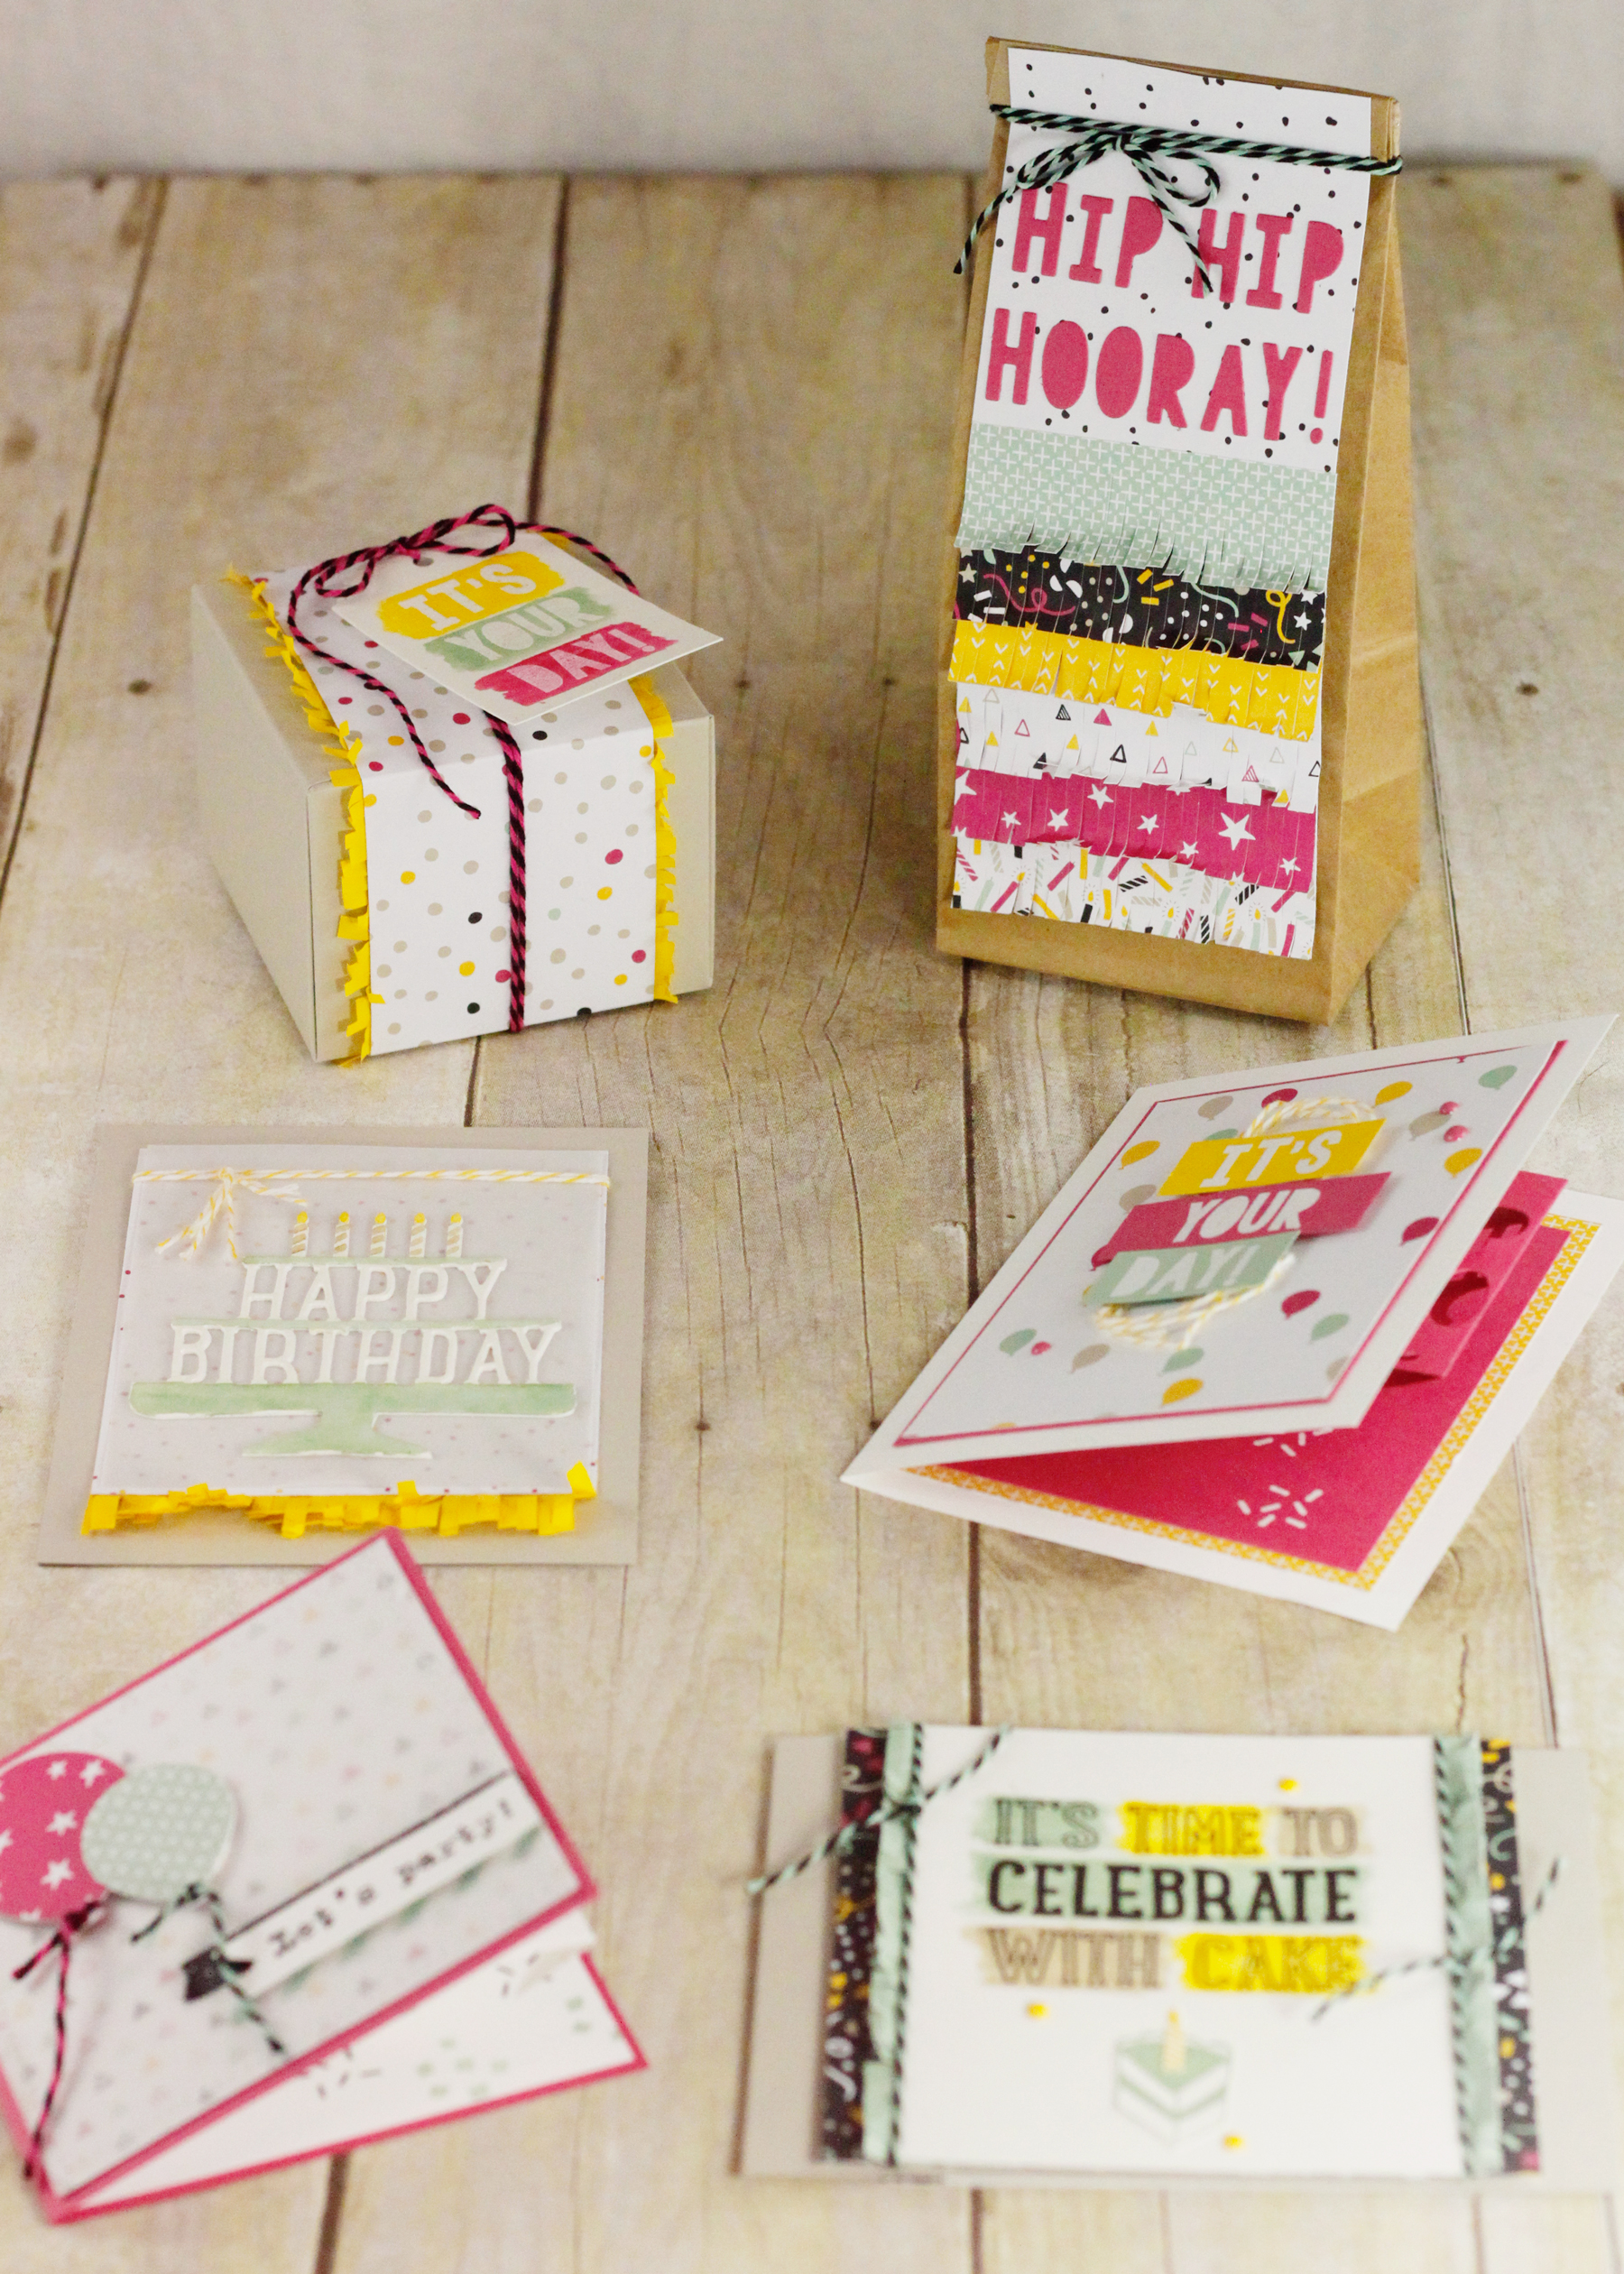 Scrapbook ideas pop up - Sct_may_susat_1